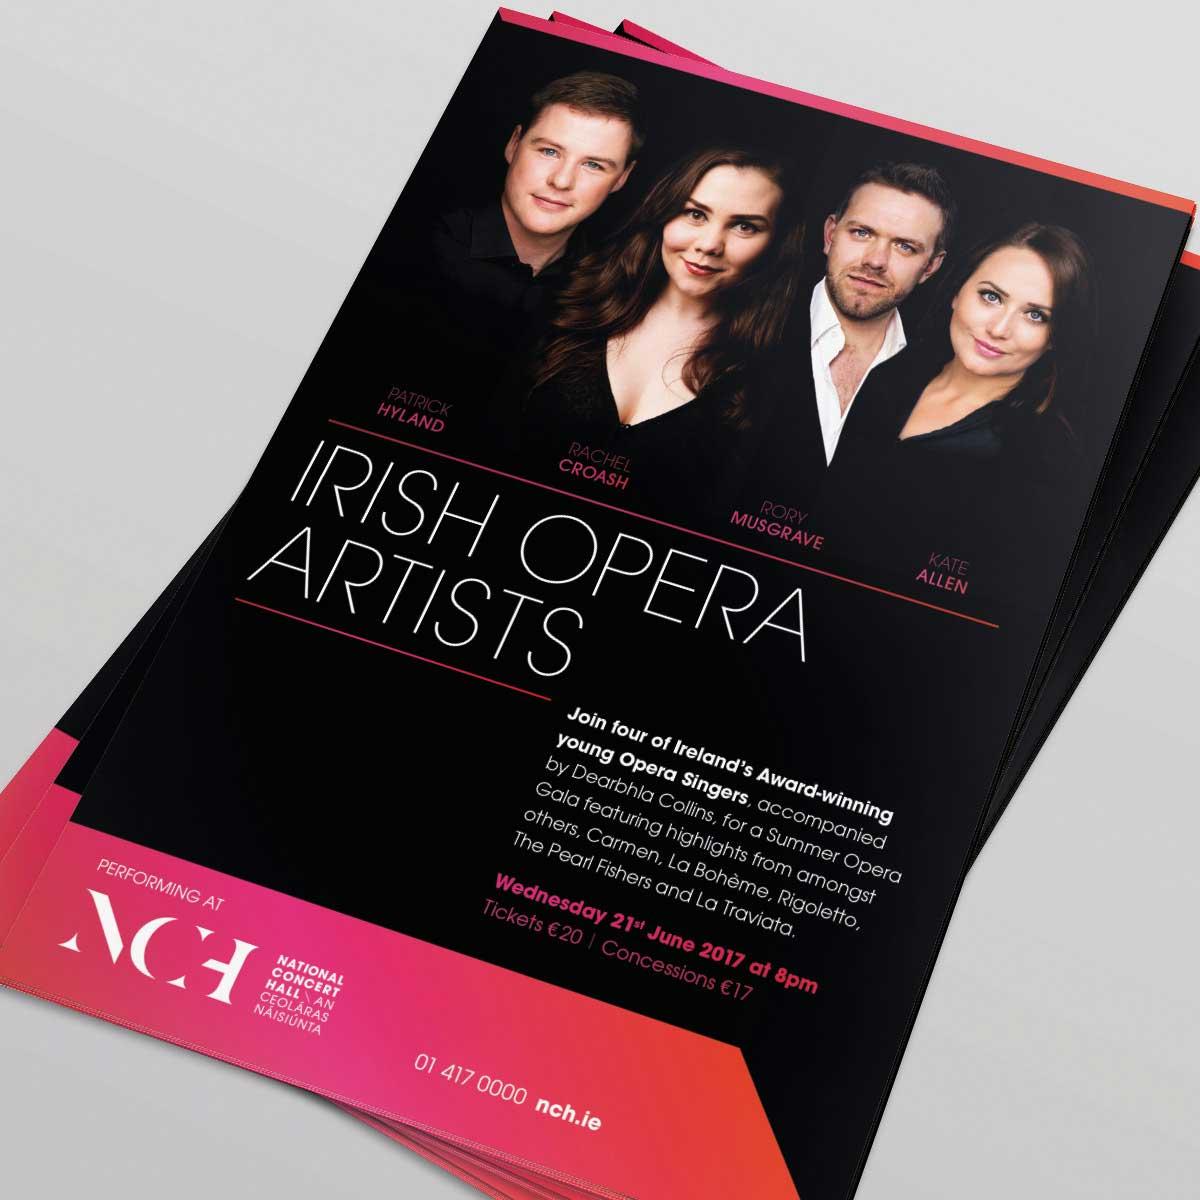 Irish Opera Artists – Brand and flyer design by Marshall Light Studio